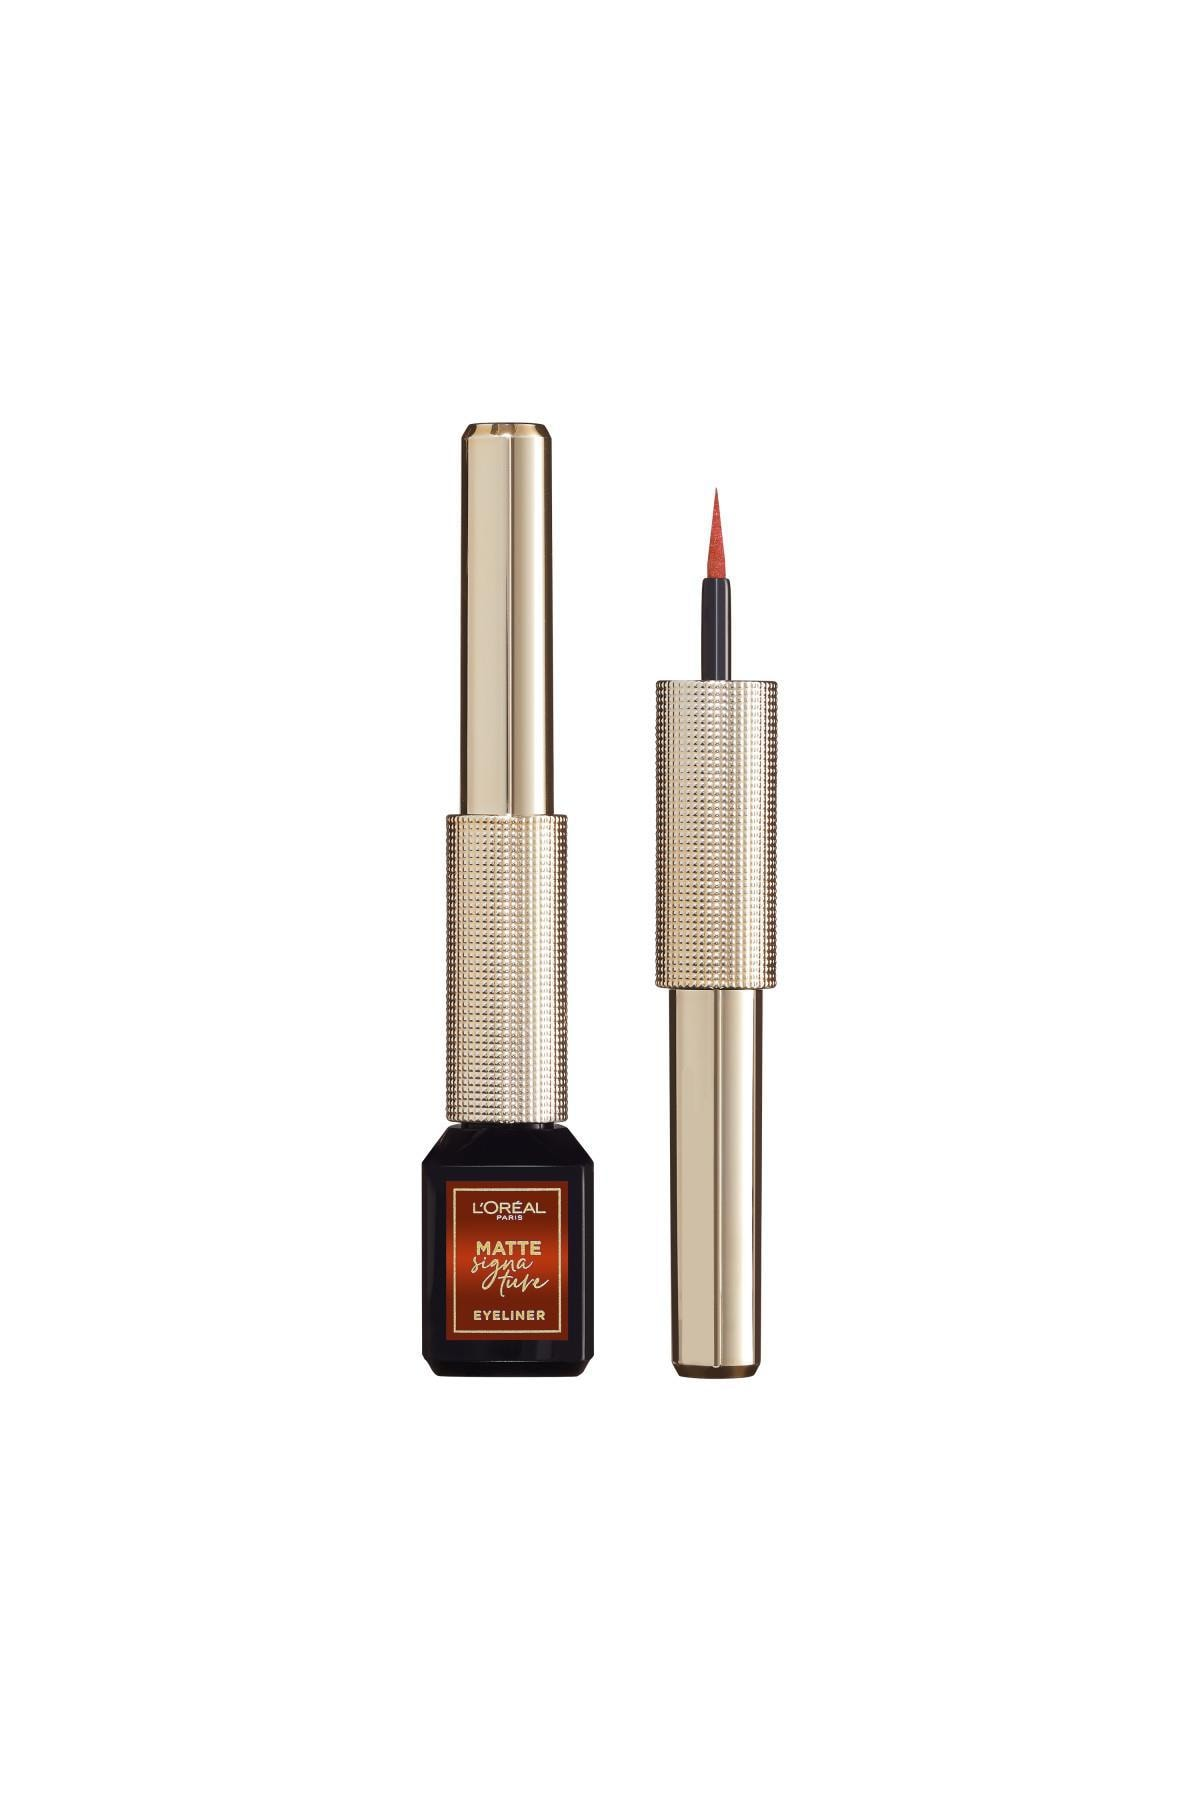 L'Oreal Paris Mat Eyeliner - Matte Signature Eyeliner 07 Copper 30175280